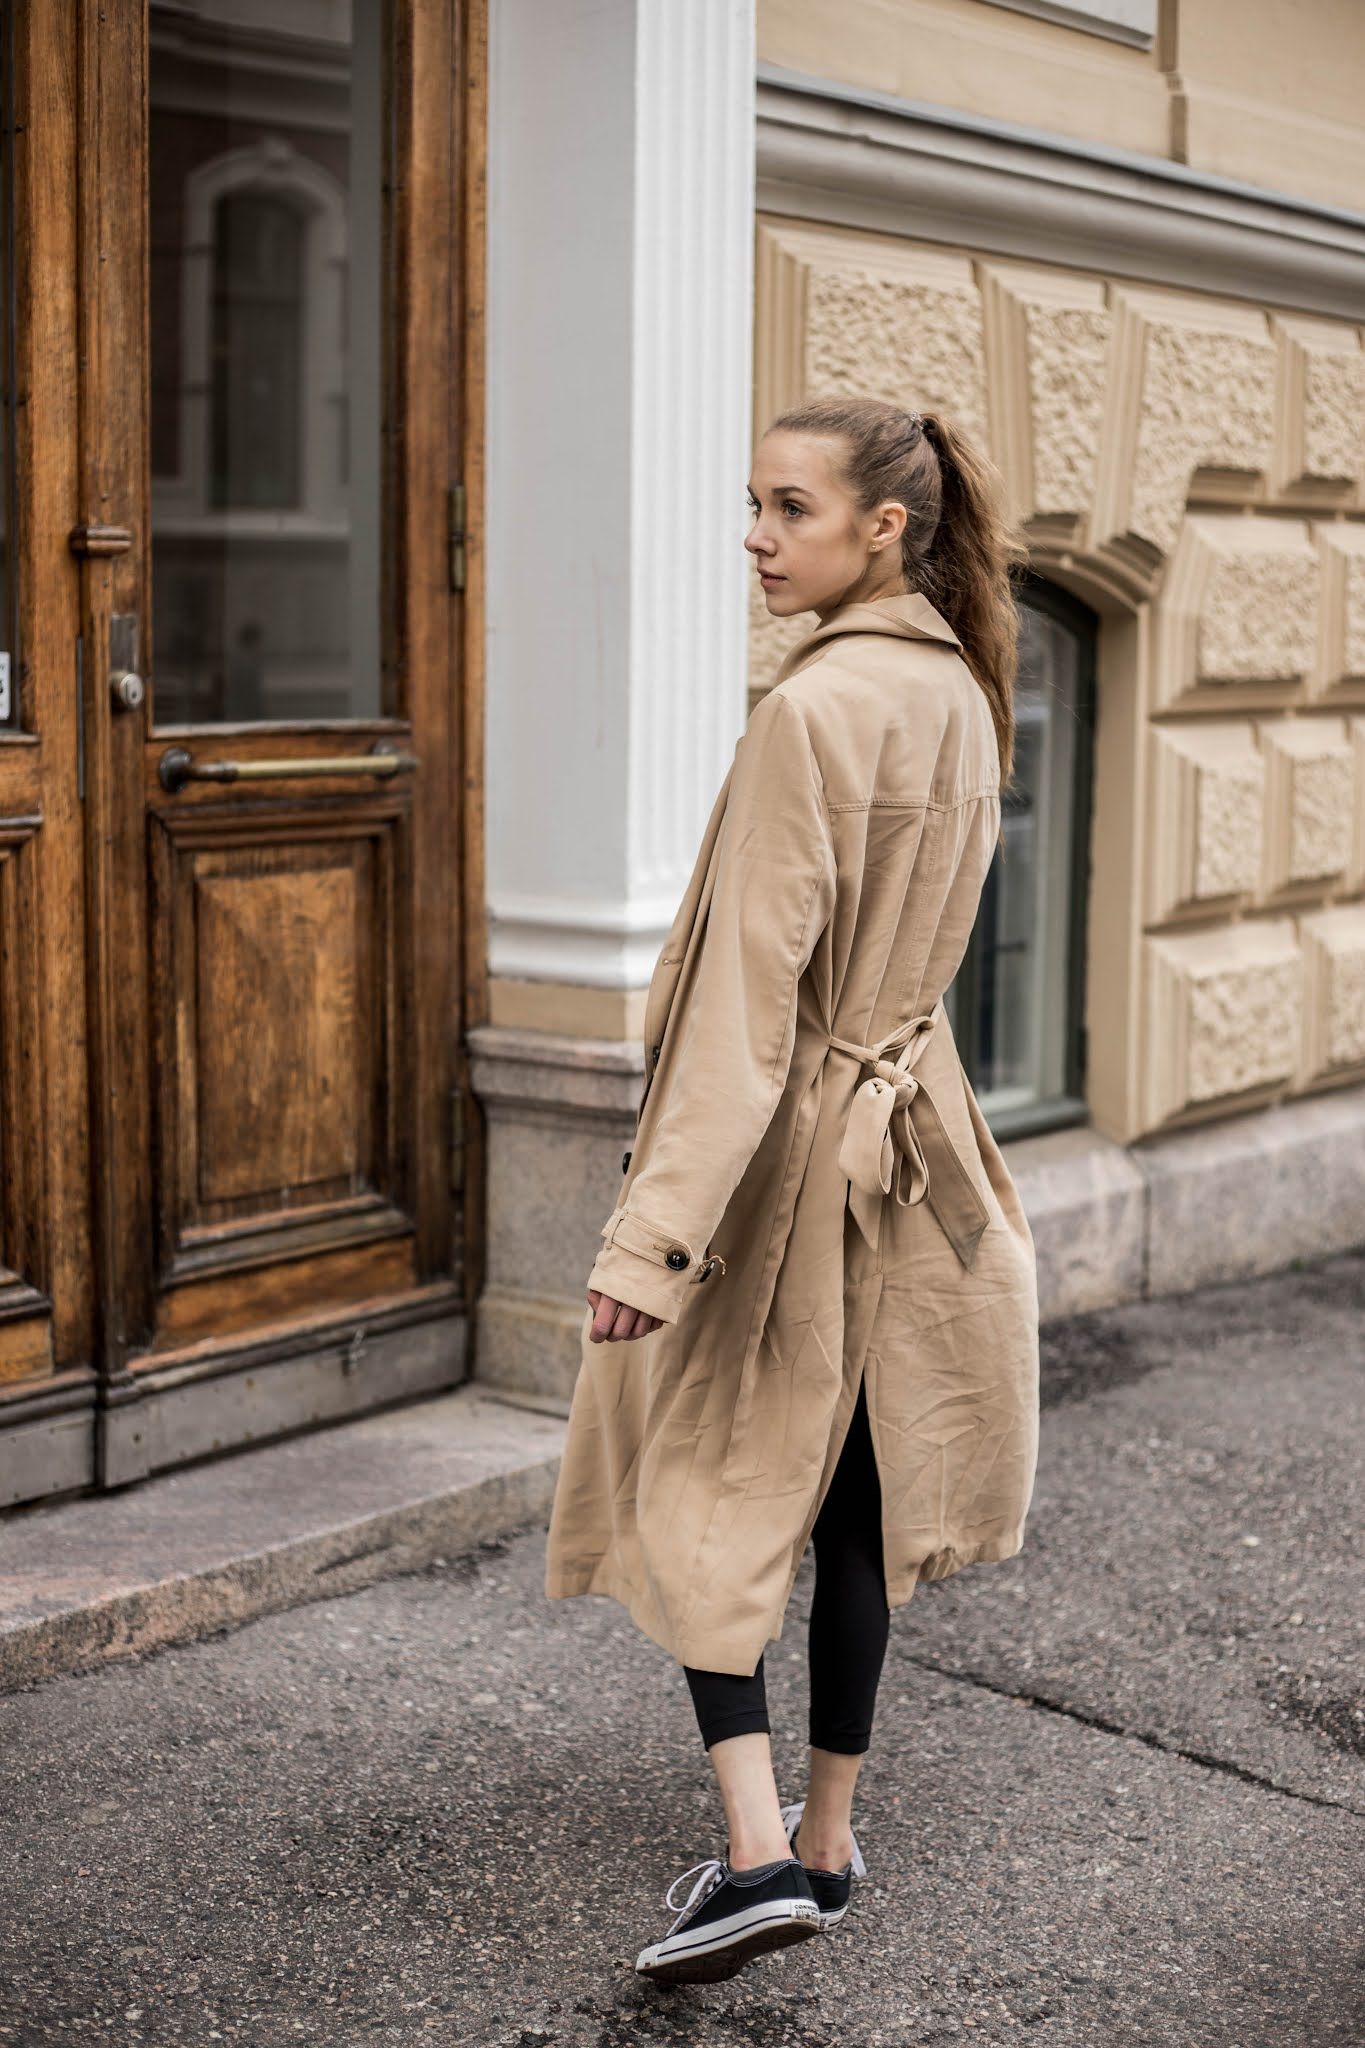 Kuinka pukea leggingsit arkena // How to war leggings in everyday life